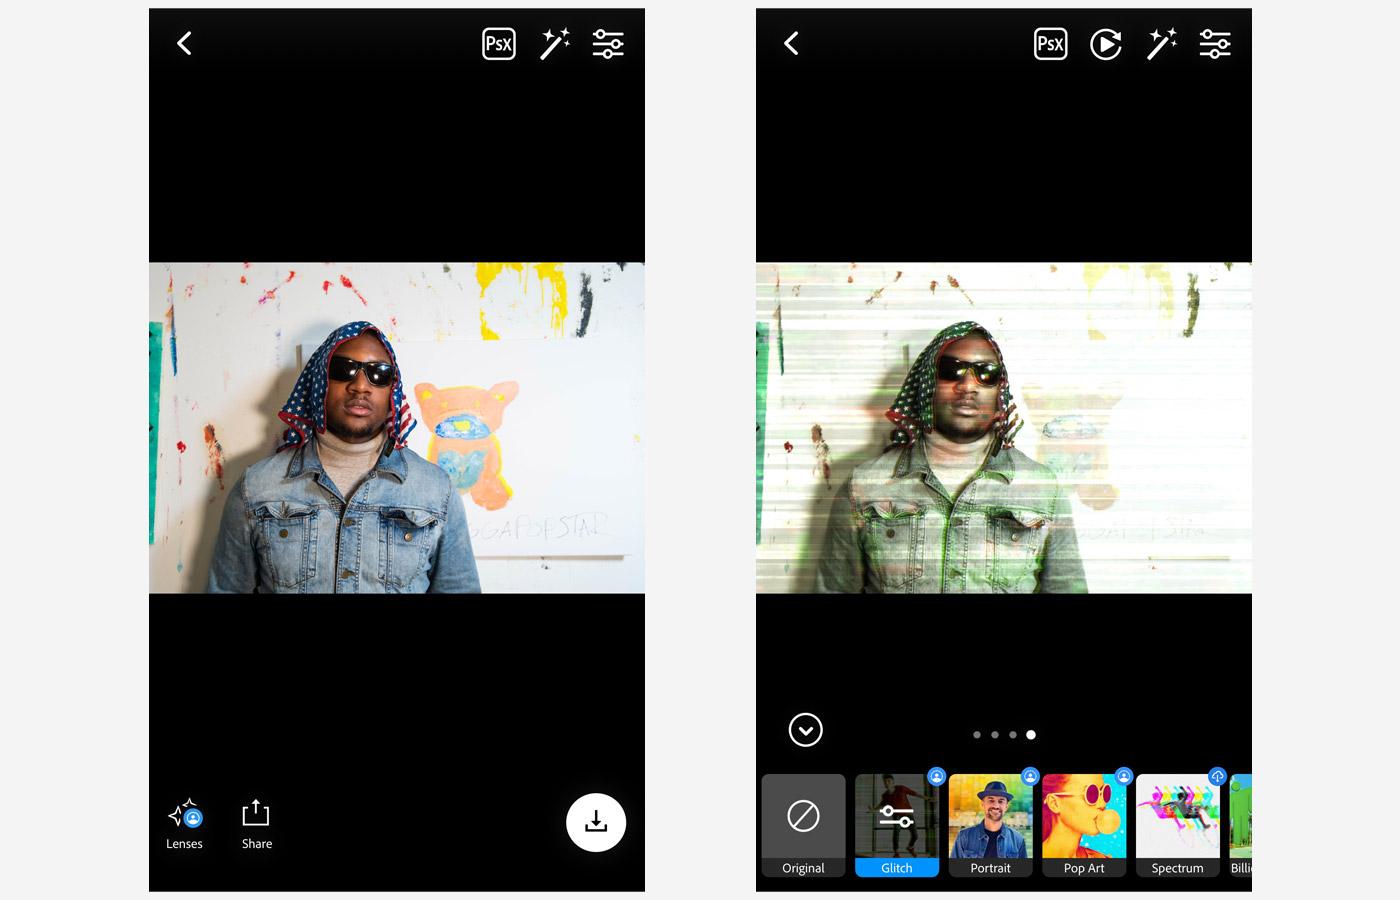 glitch lens ps camera app